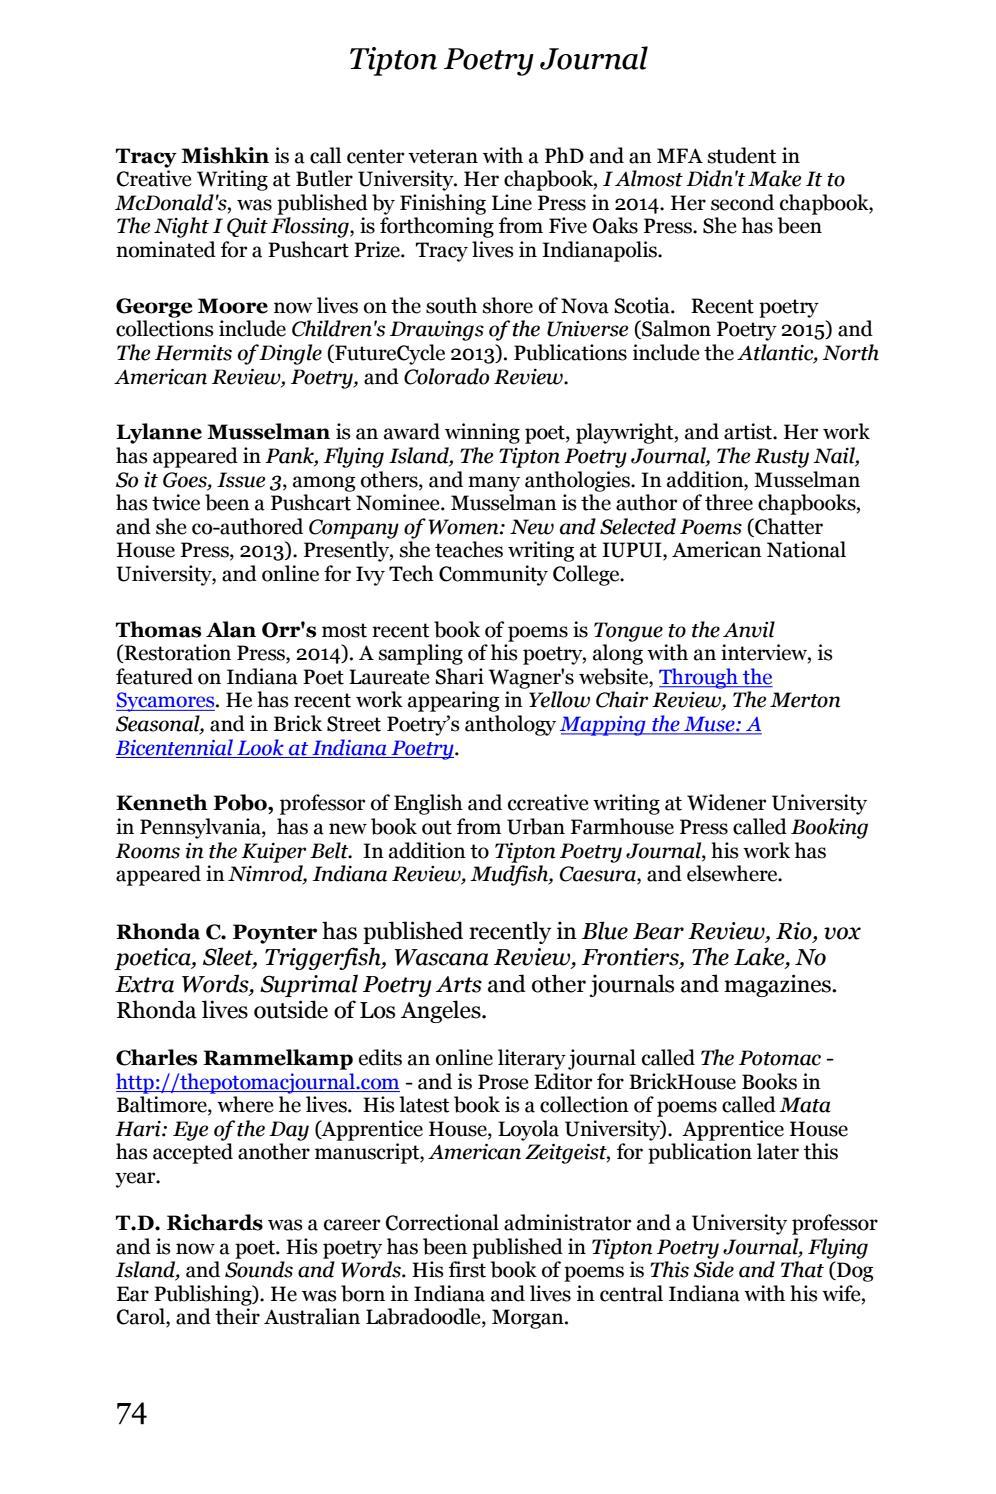 Tipton Poetry Journal #30 By Tipton Poetry Journal   Issuu